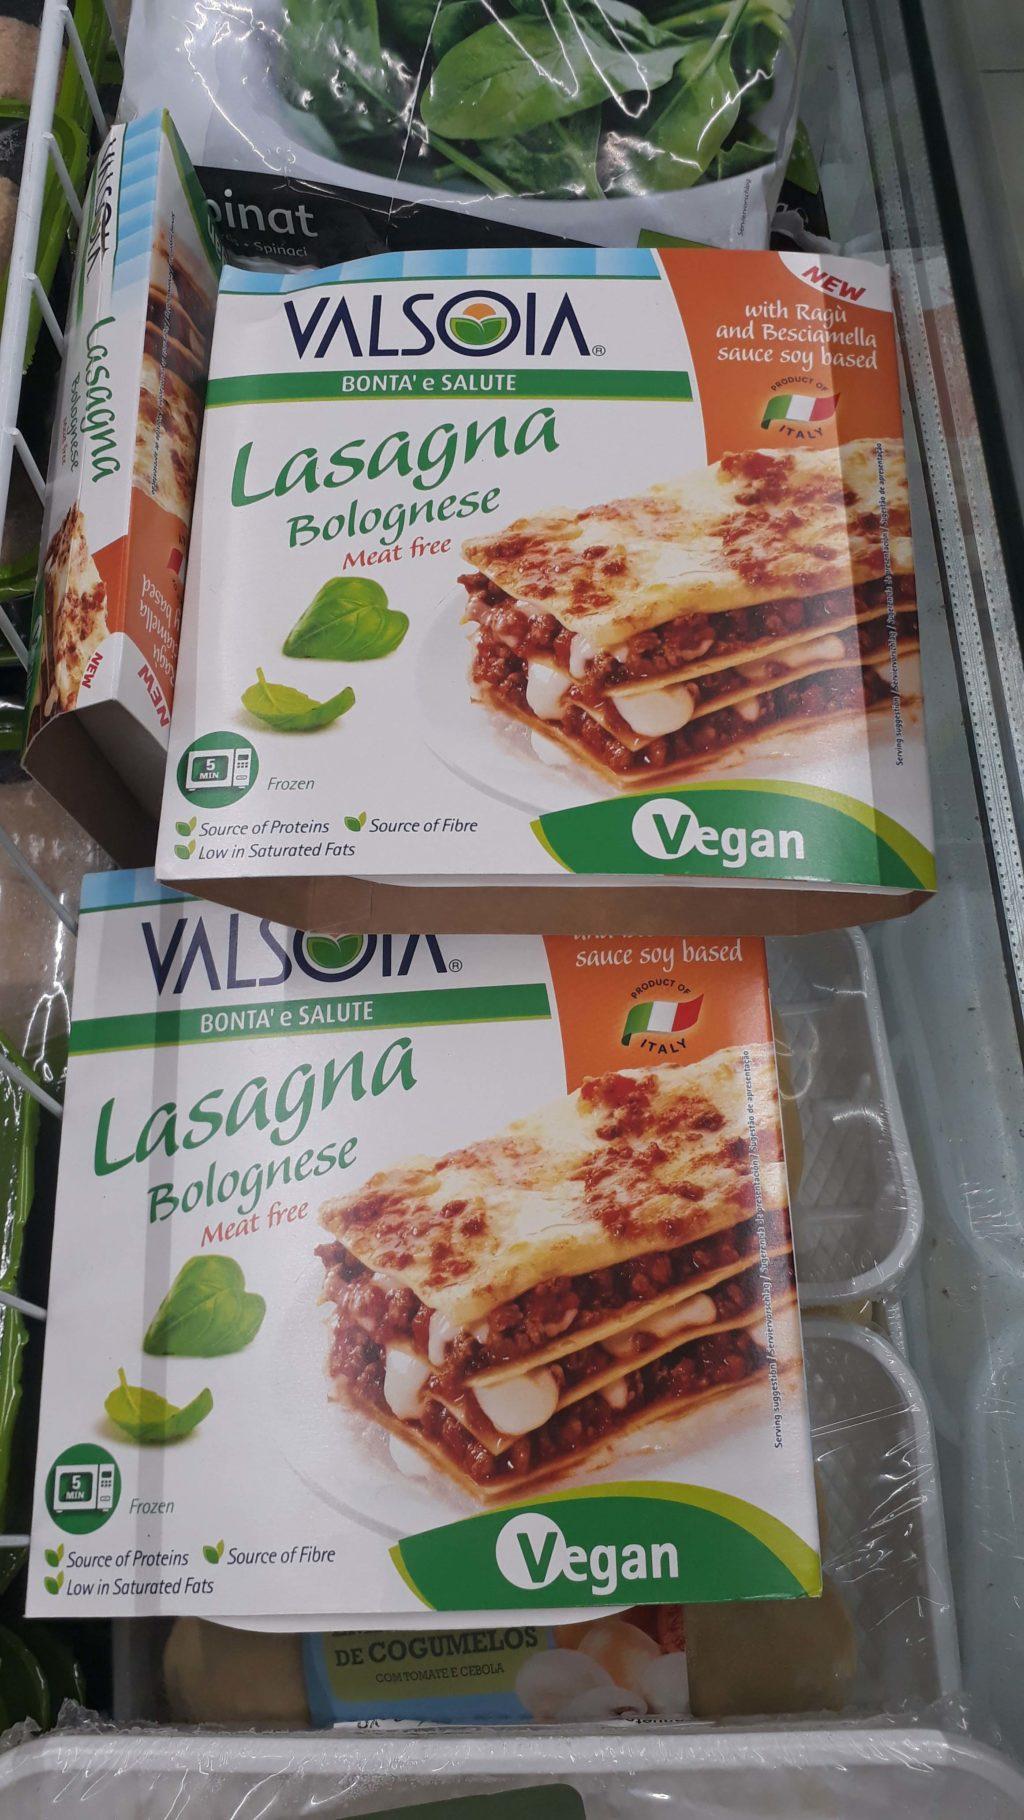 Frozen lasagna from Valsoia